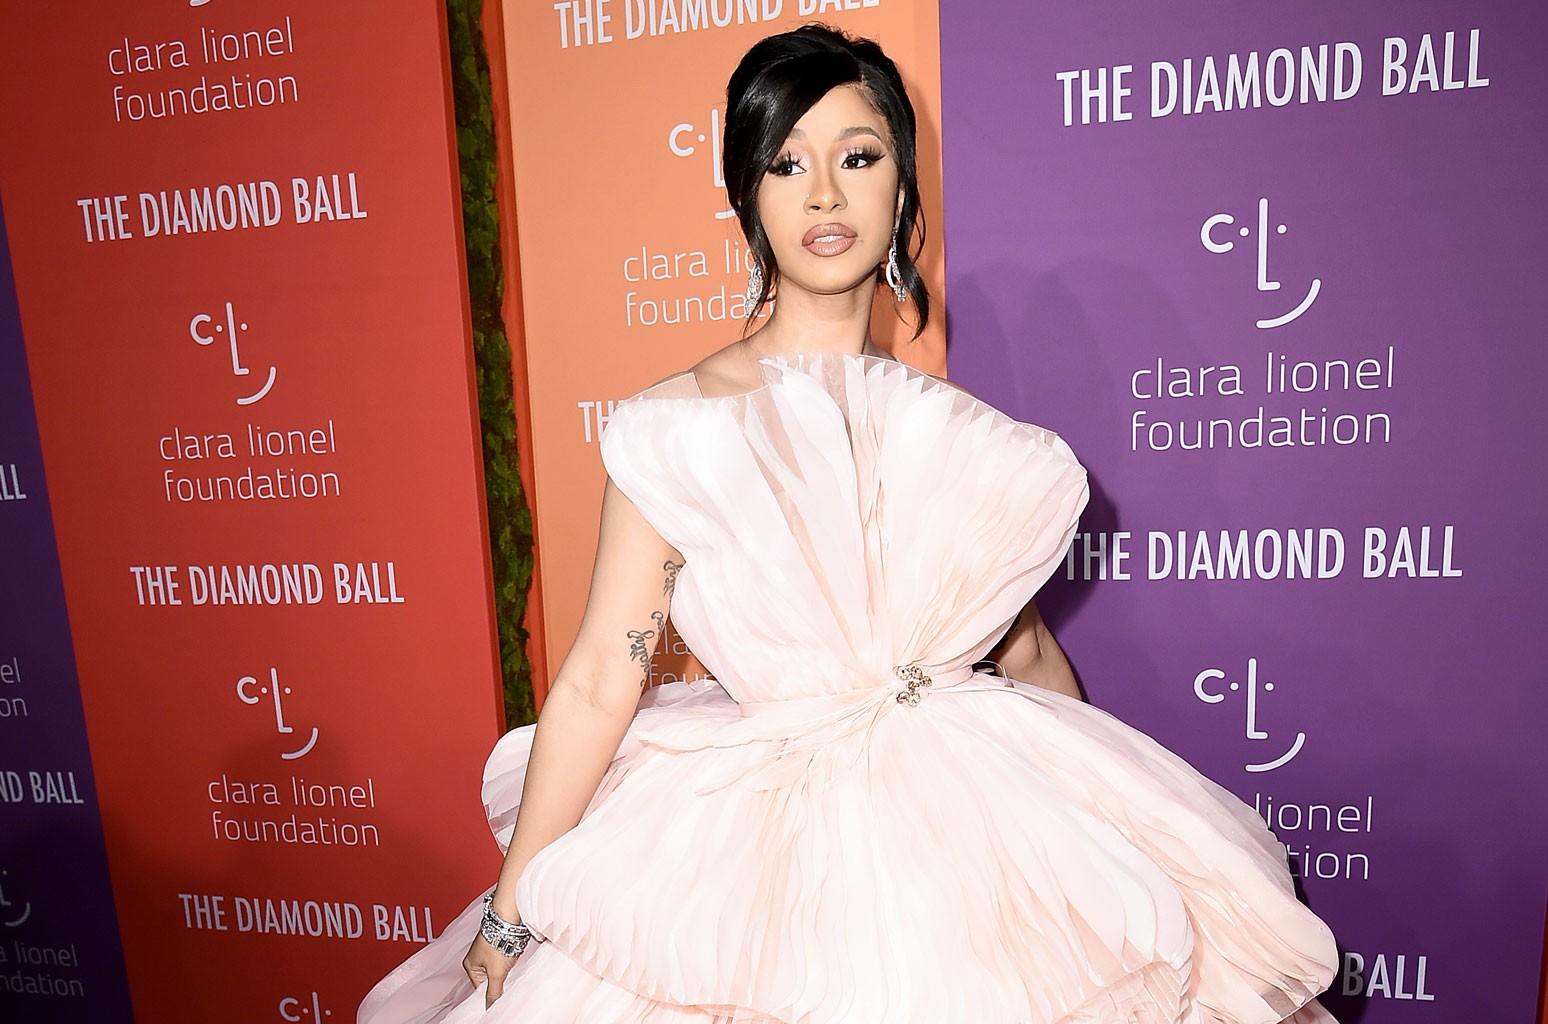 Cardi B Plans to Listen to Selena Gomez's 'Revelacion' EP in the Shower